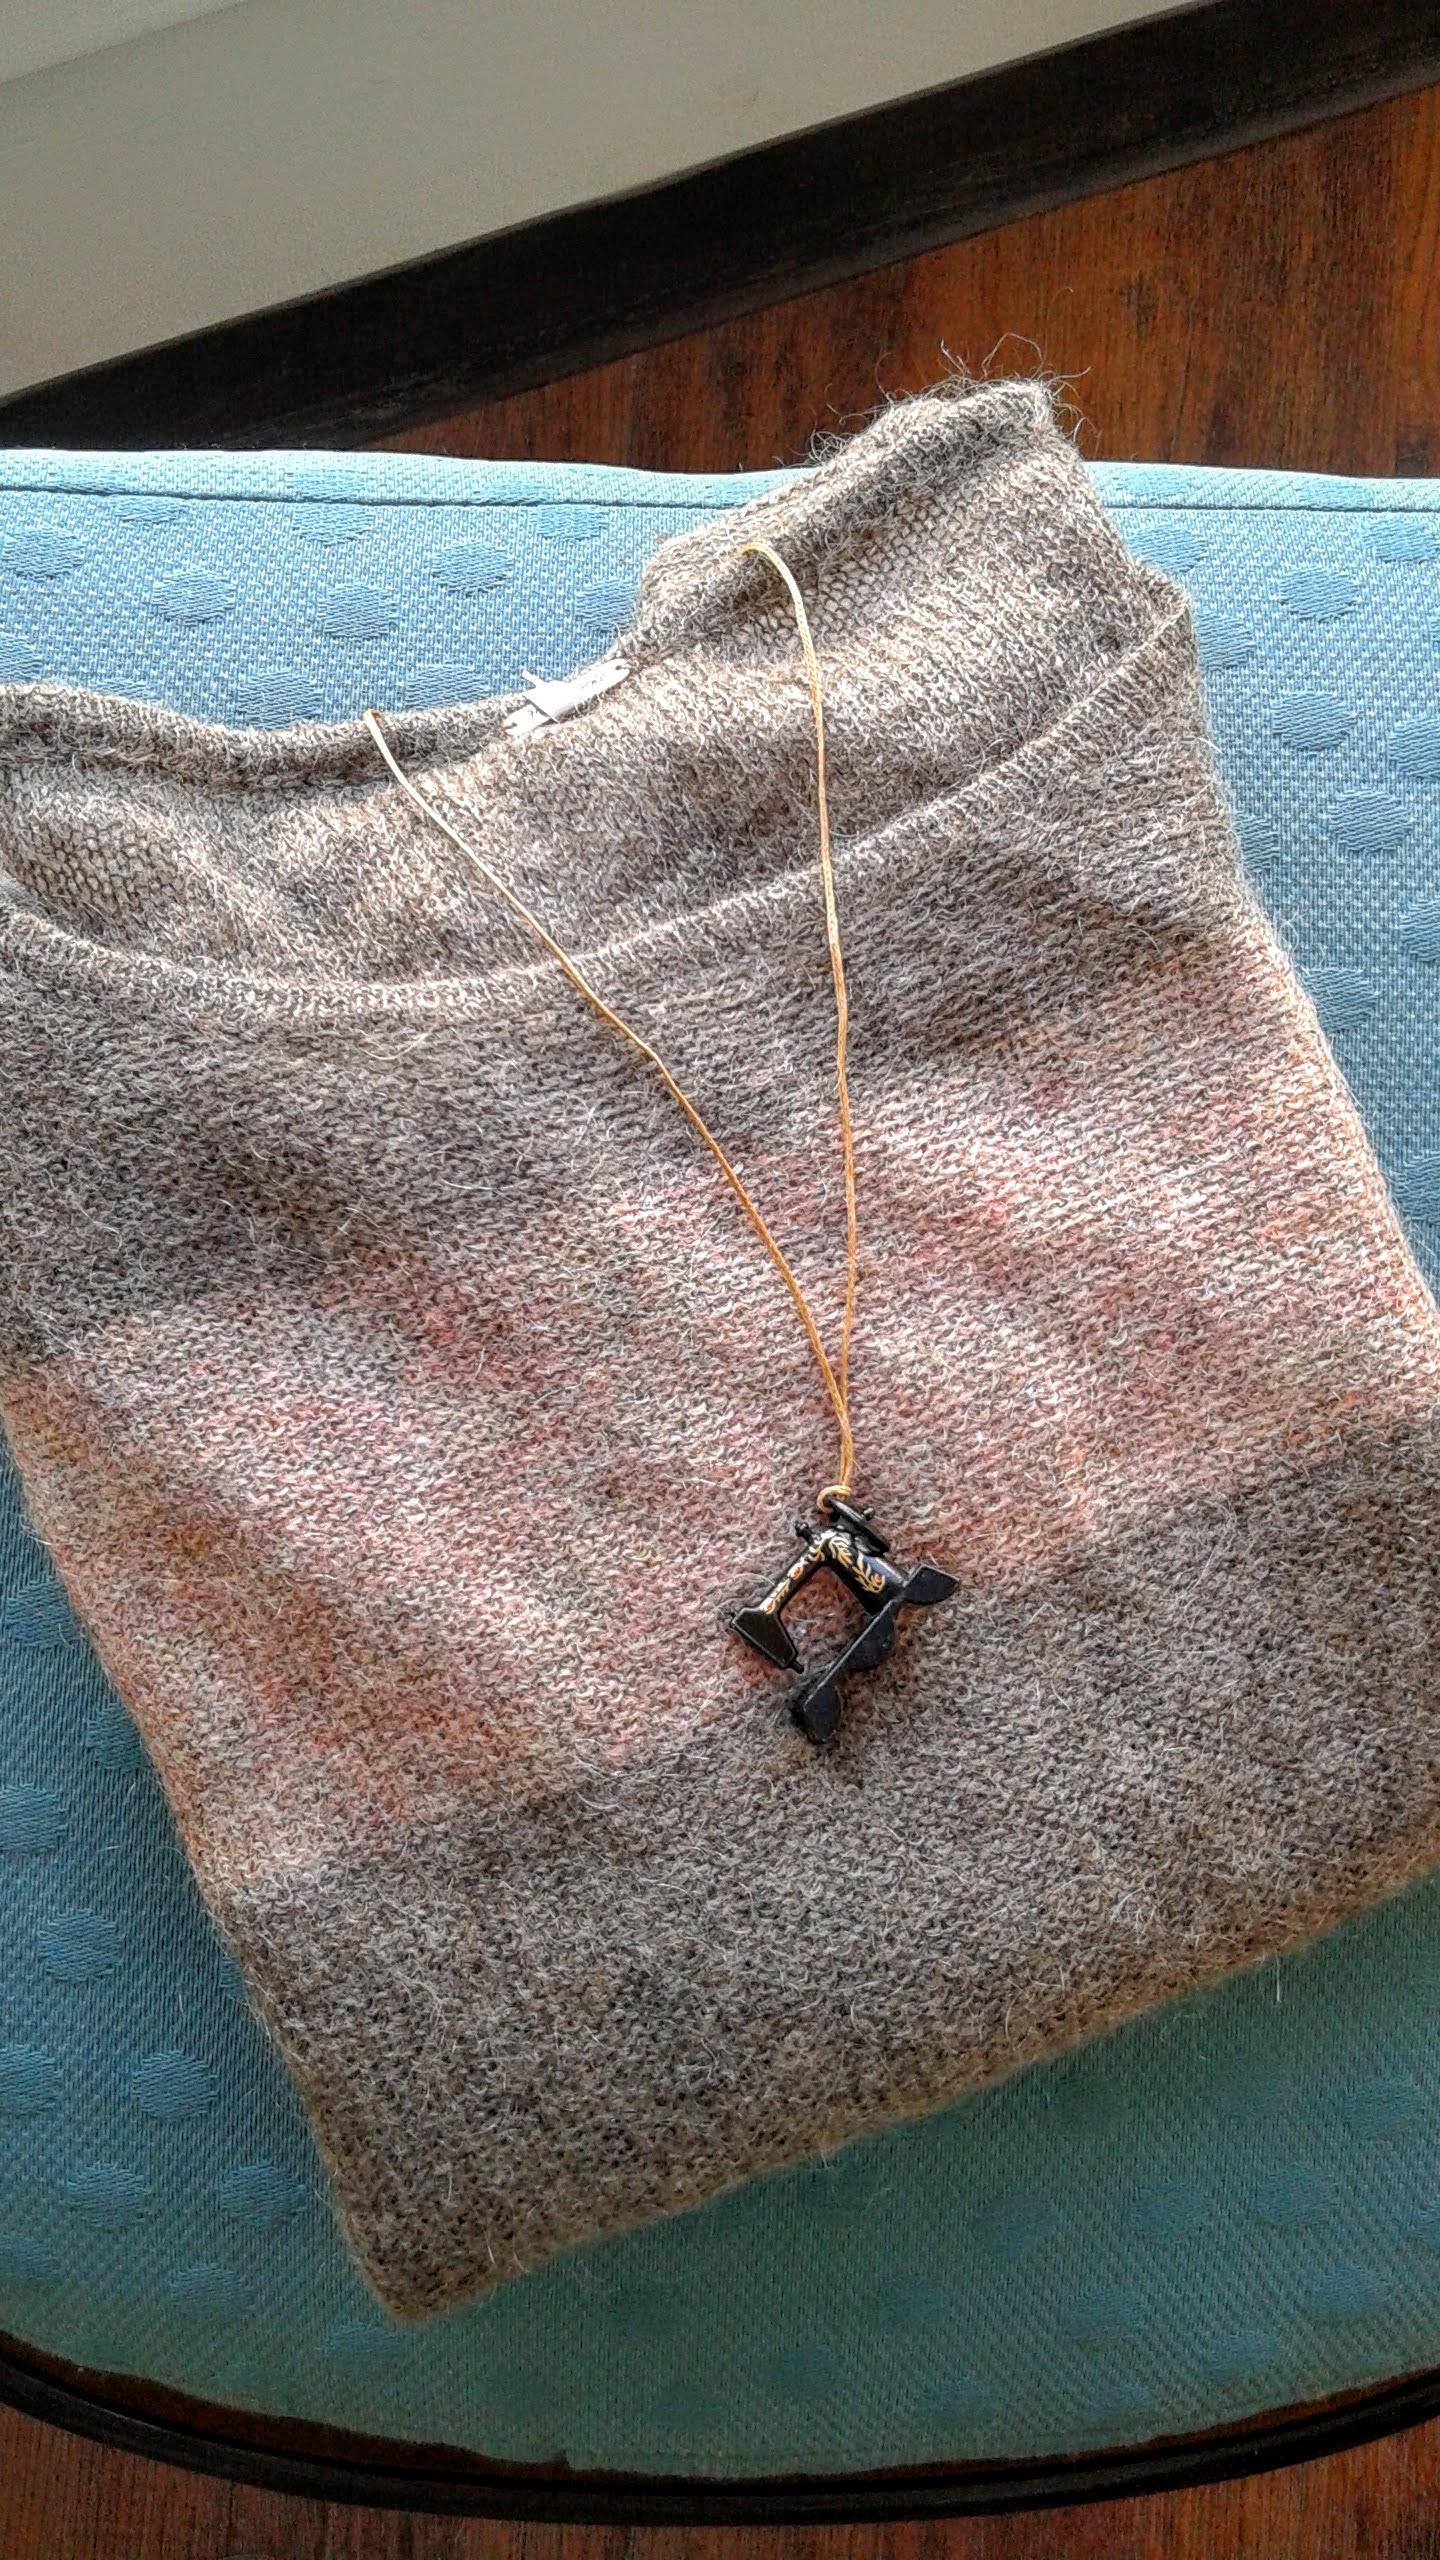 Sewing machine pendant